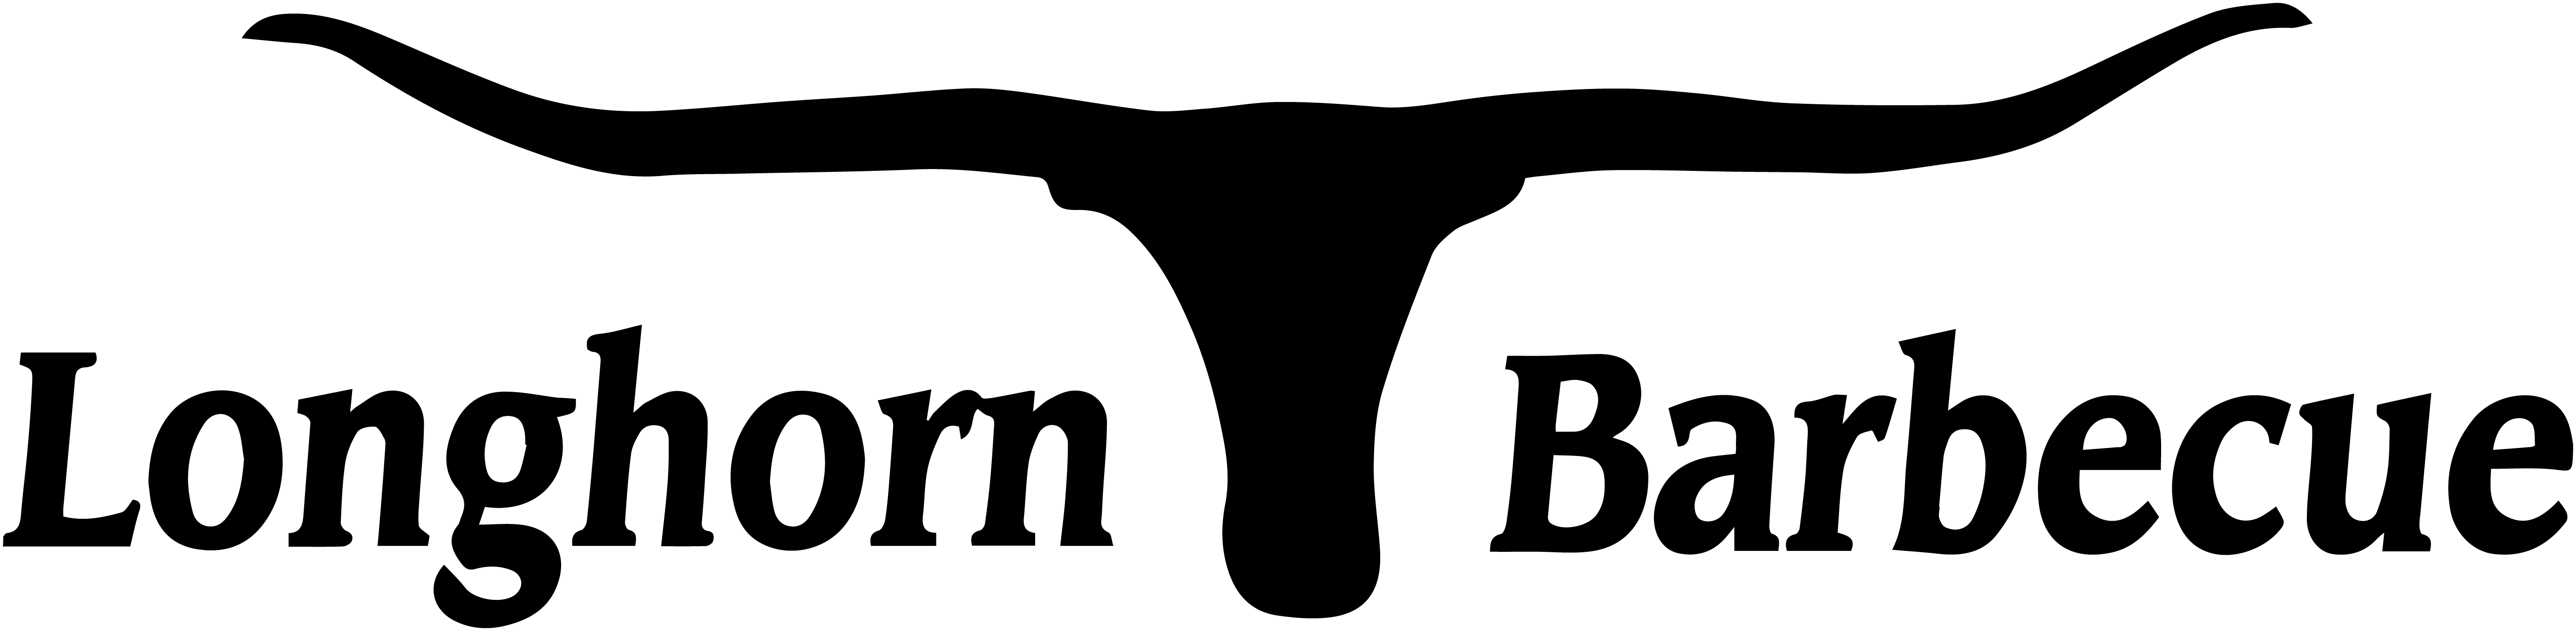 Longhorn BBQ Logo